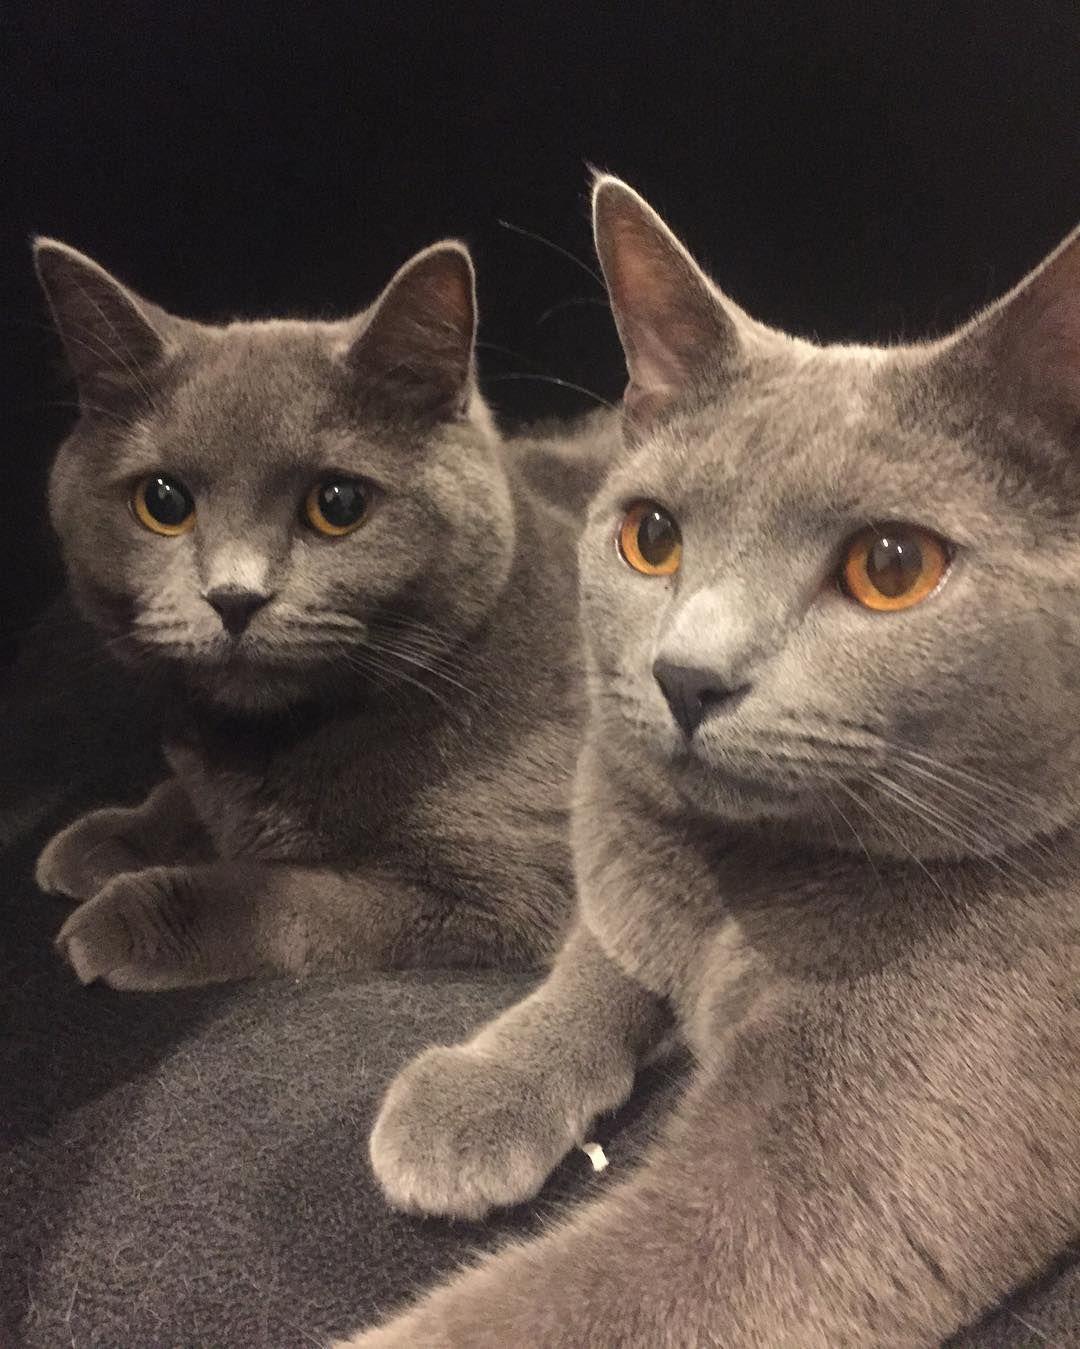 Hello World Catsofinstagram Cats Nalakeegan Britishblue Chartreux Instagramcat Petme British French London By Nala Chartreux Cats Of Instagram Cats